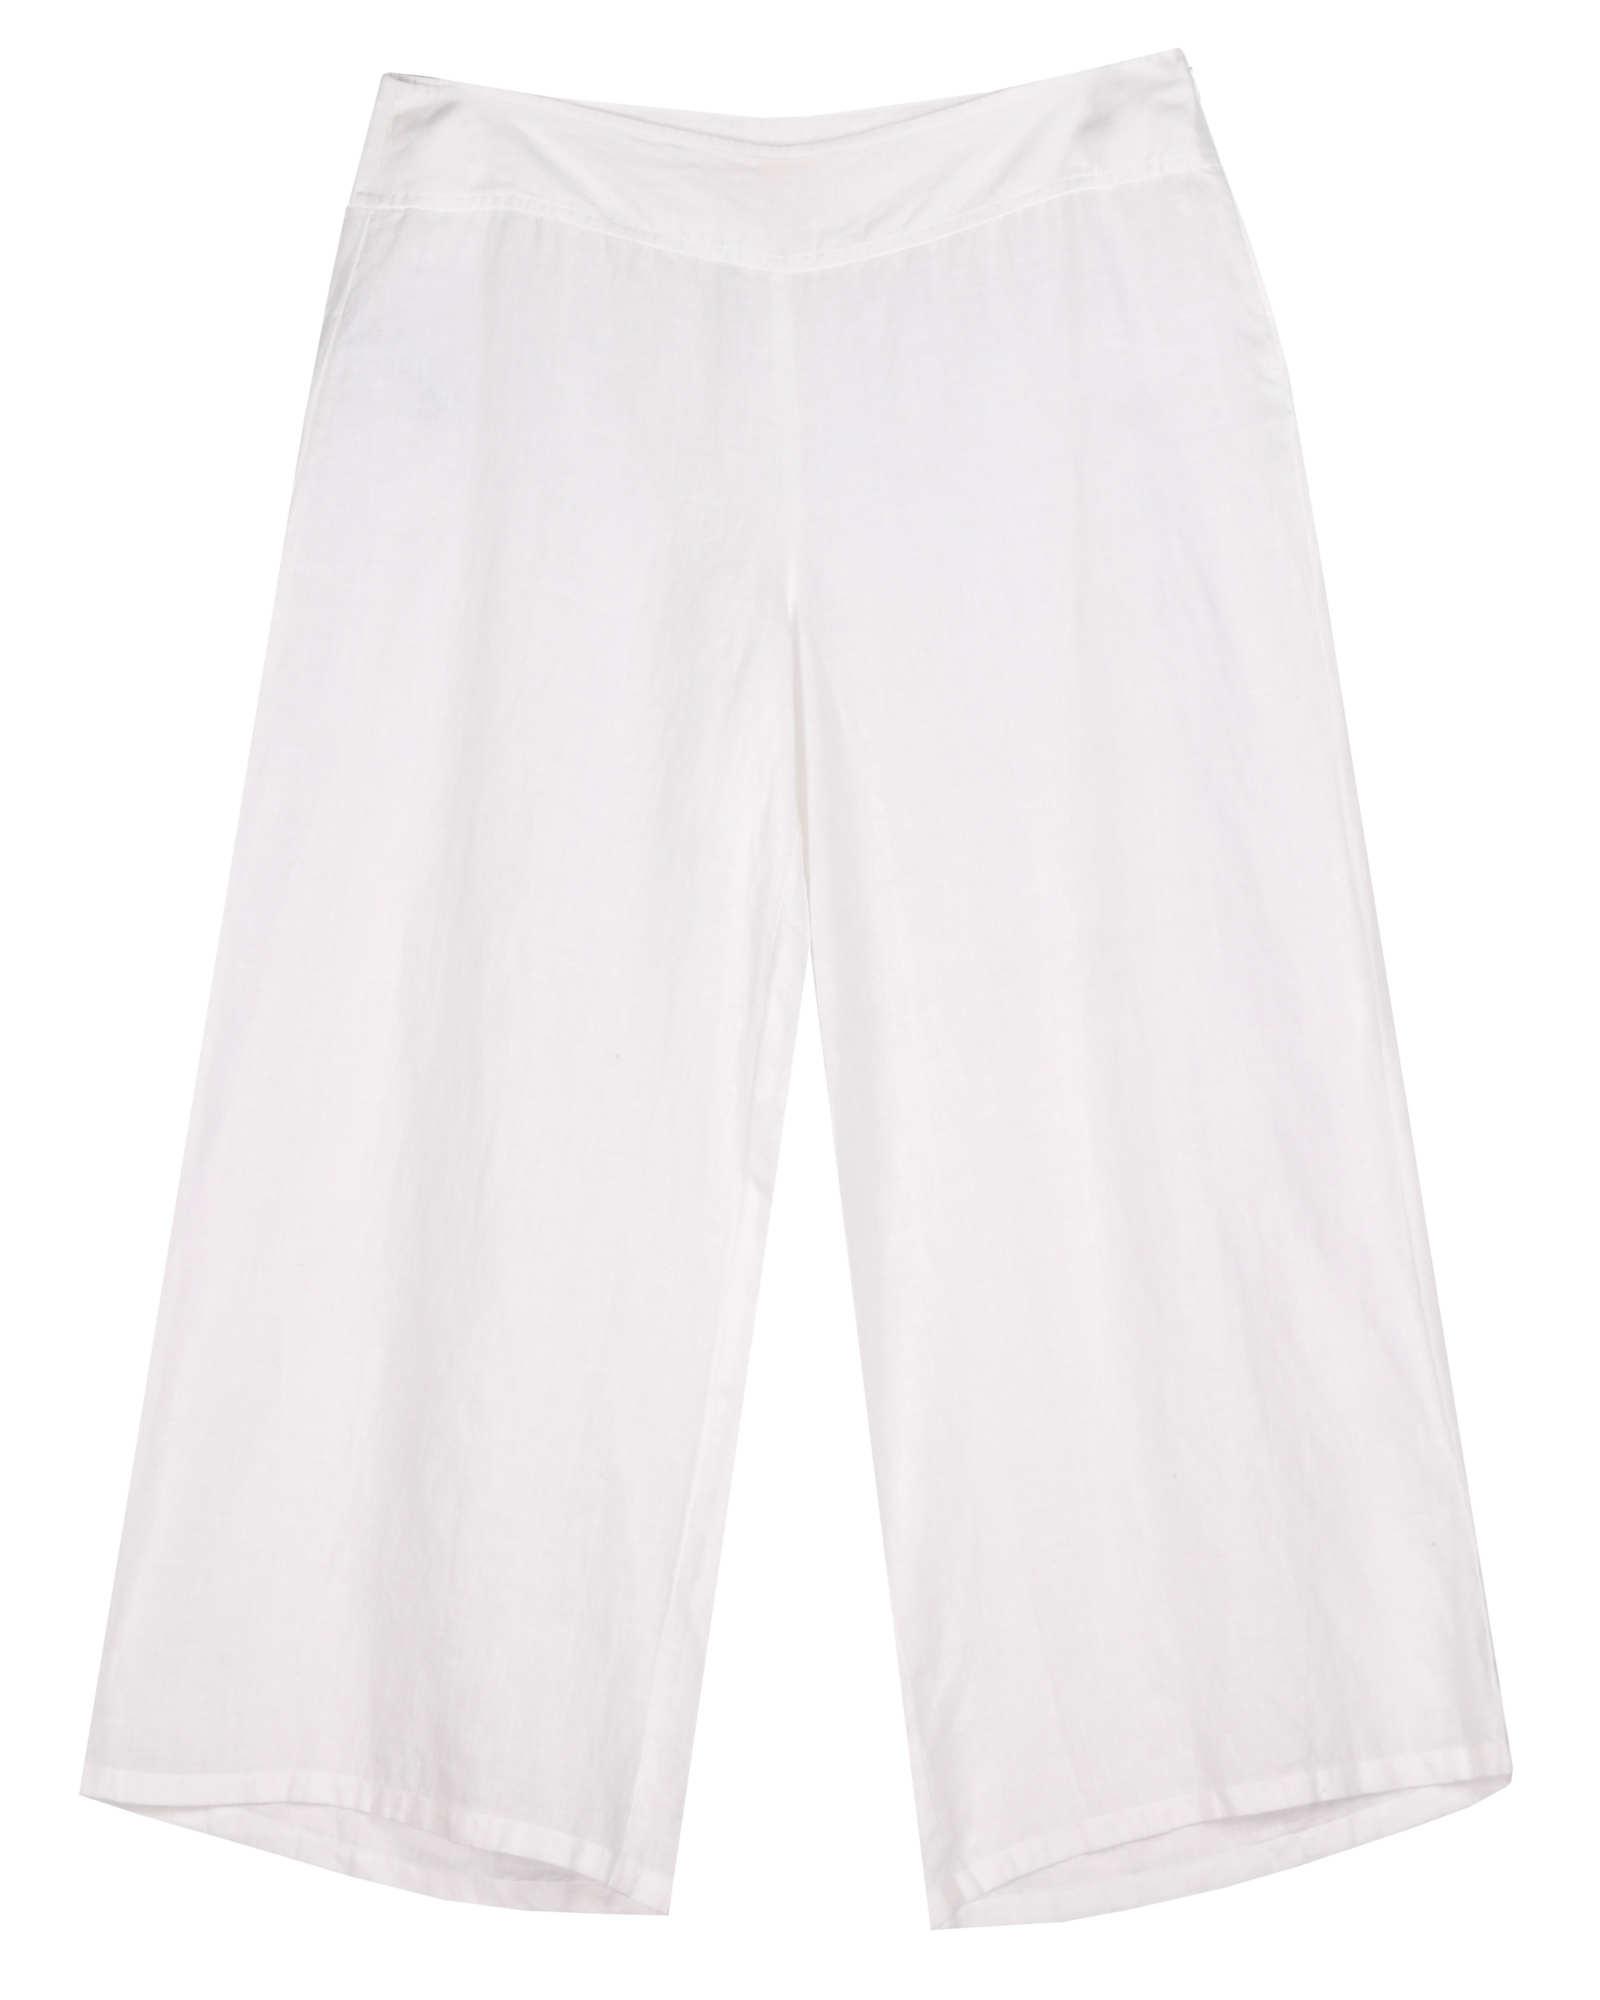 Organic Handkerchief Linen Pant